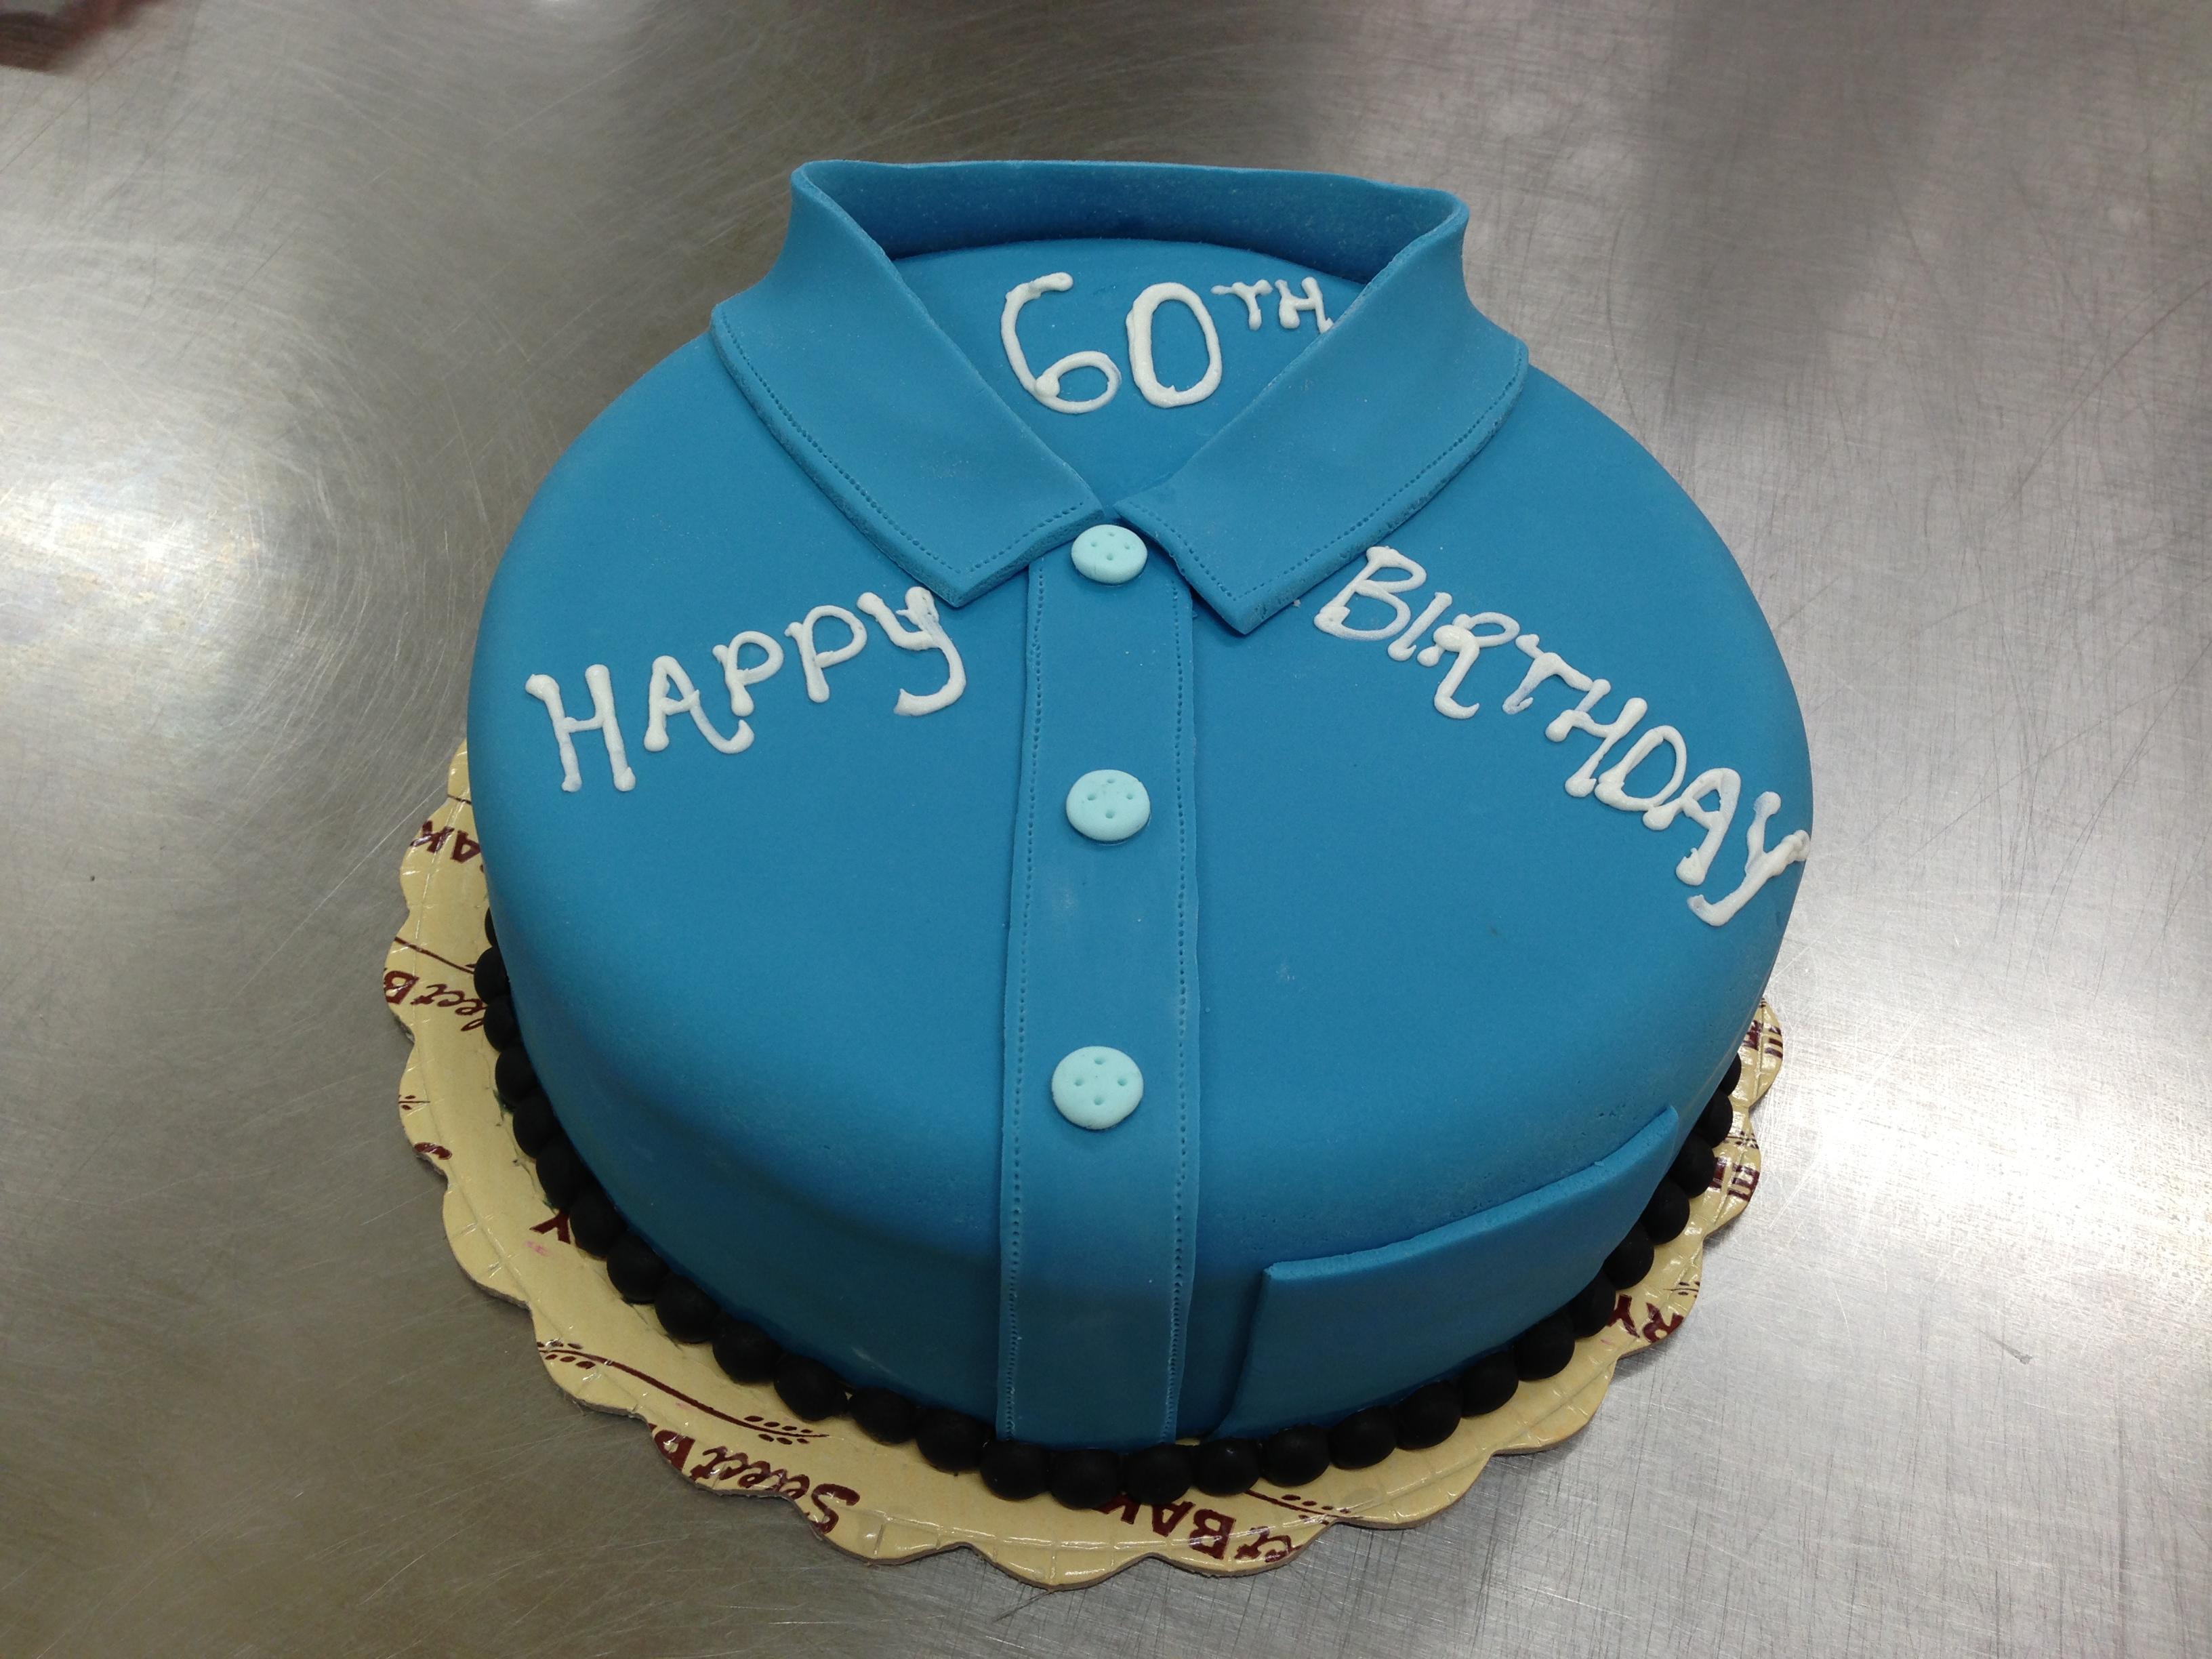 Dads 60th Birthday Cake